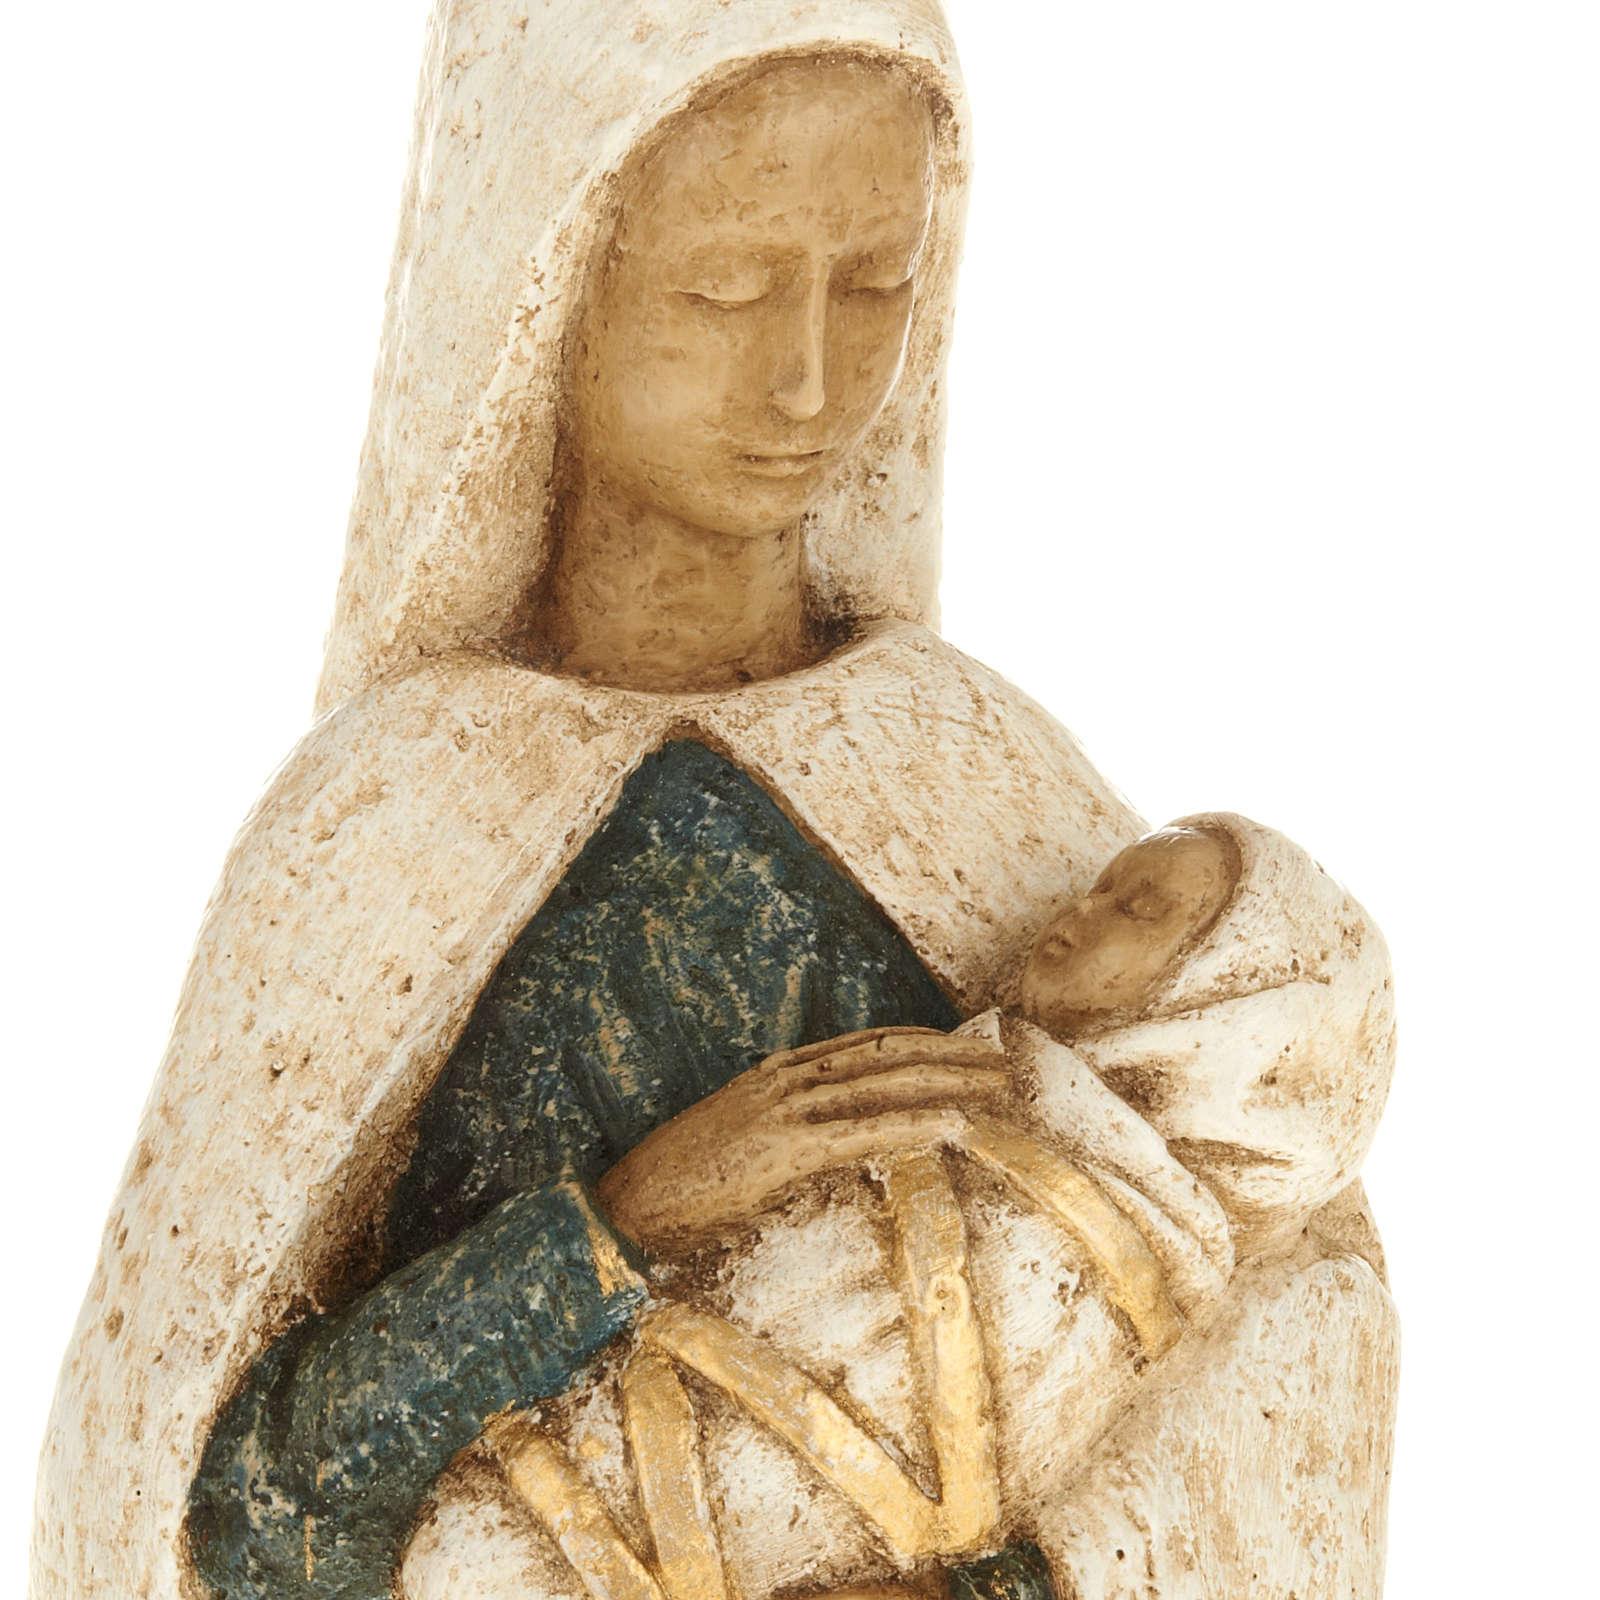 Virgin Mary with baby Jesus stone statue, Bethléem monast 4